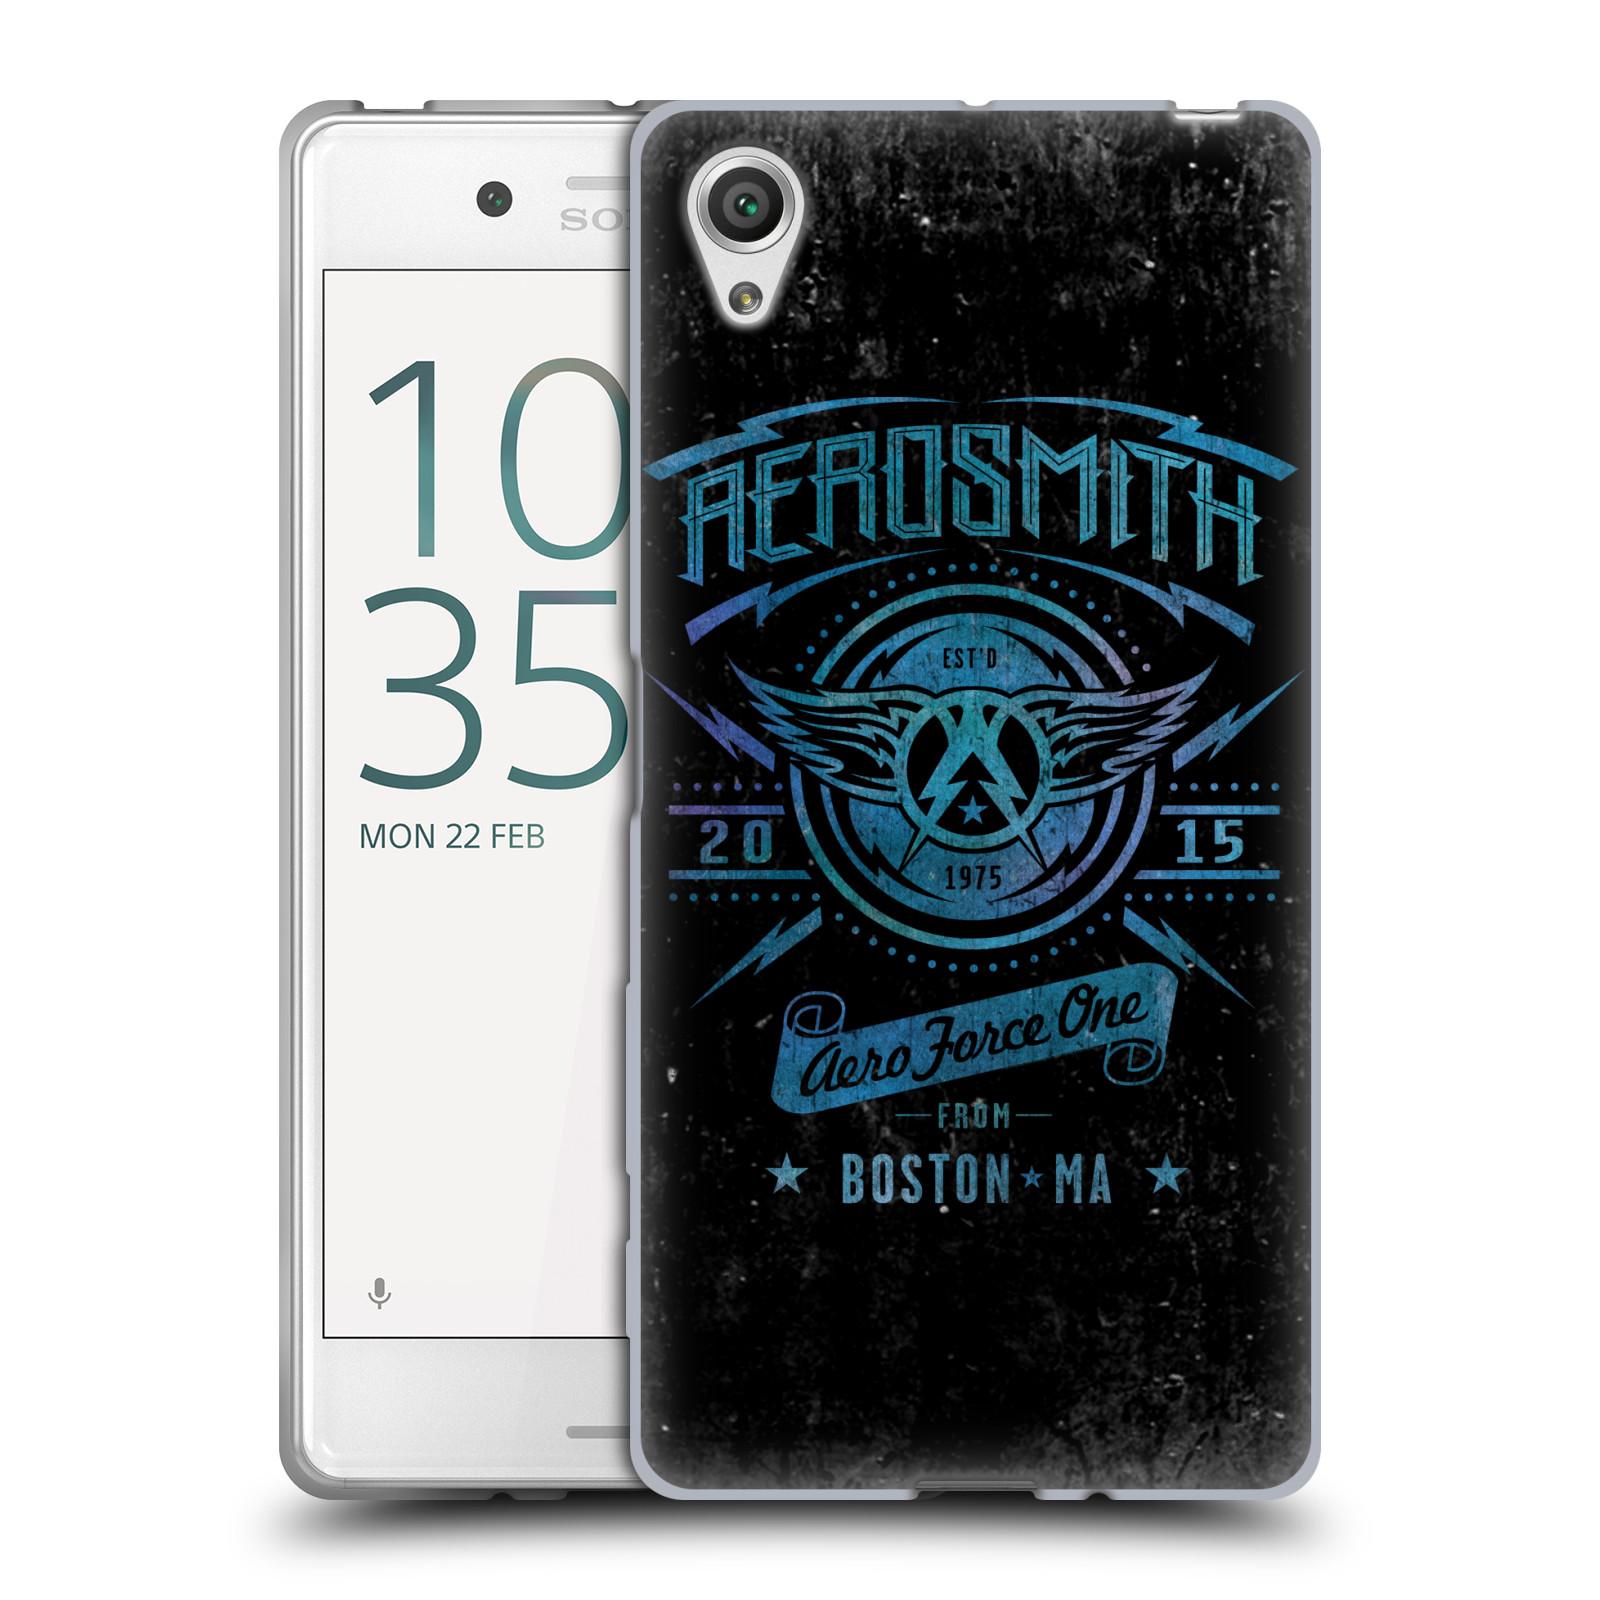 Silikonové pouzdro na mobil Sony Xperia X HEAD CASE - Aerosmith - Aero Force One